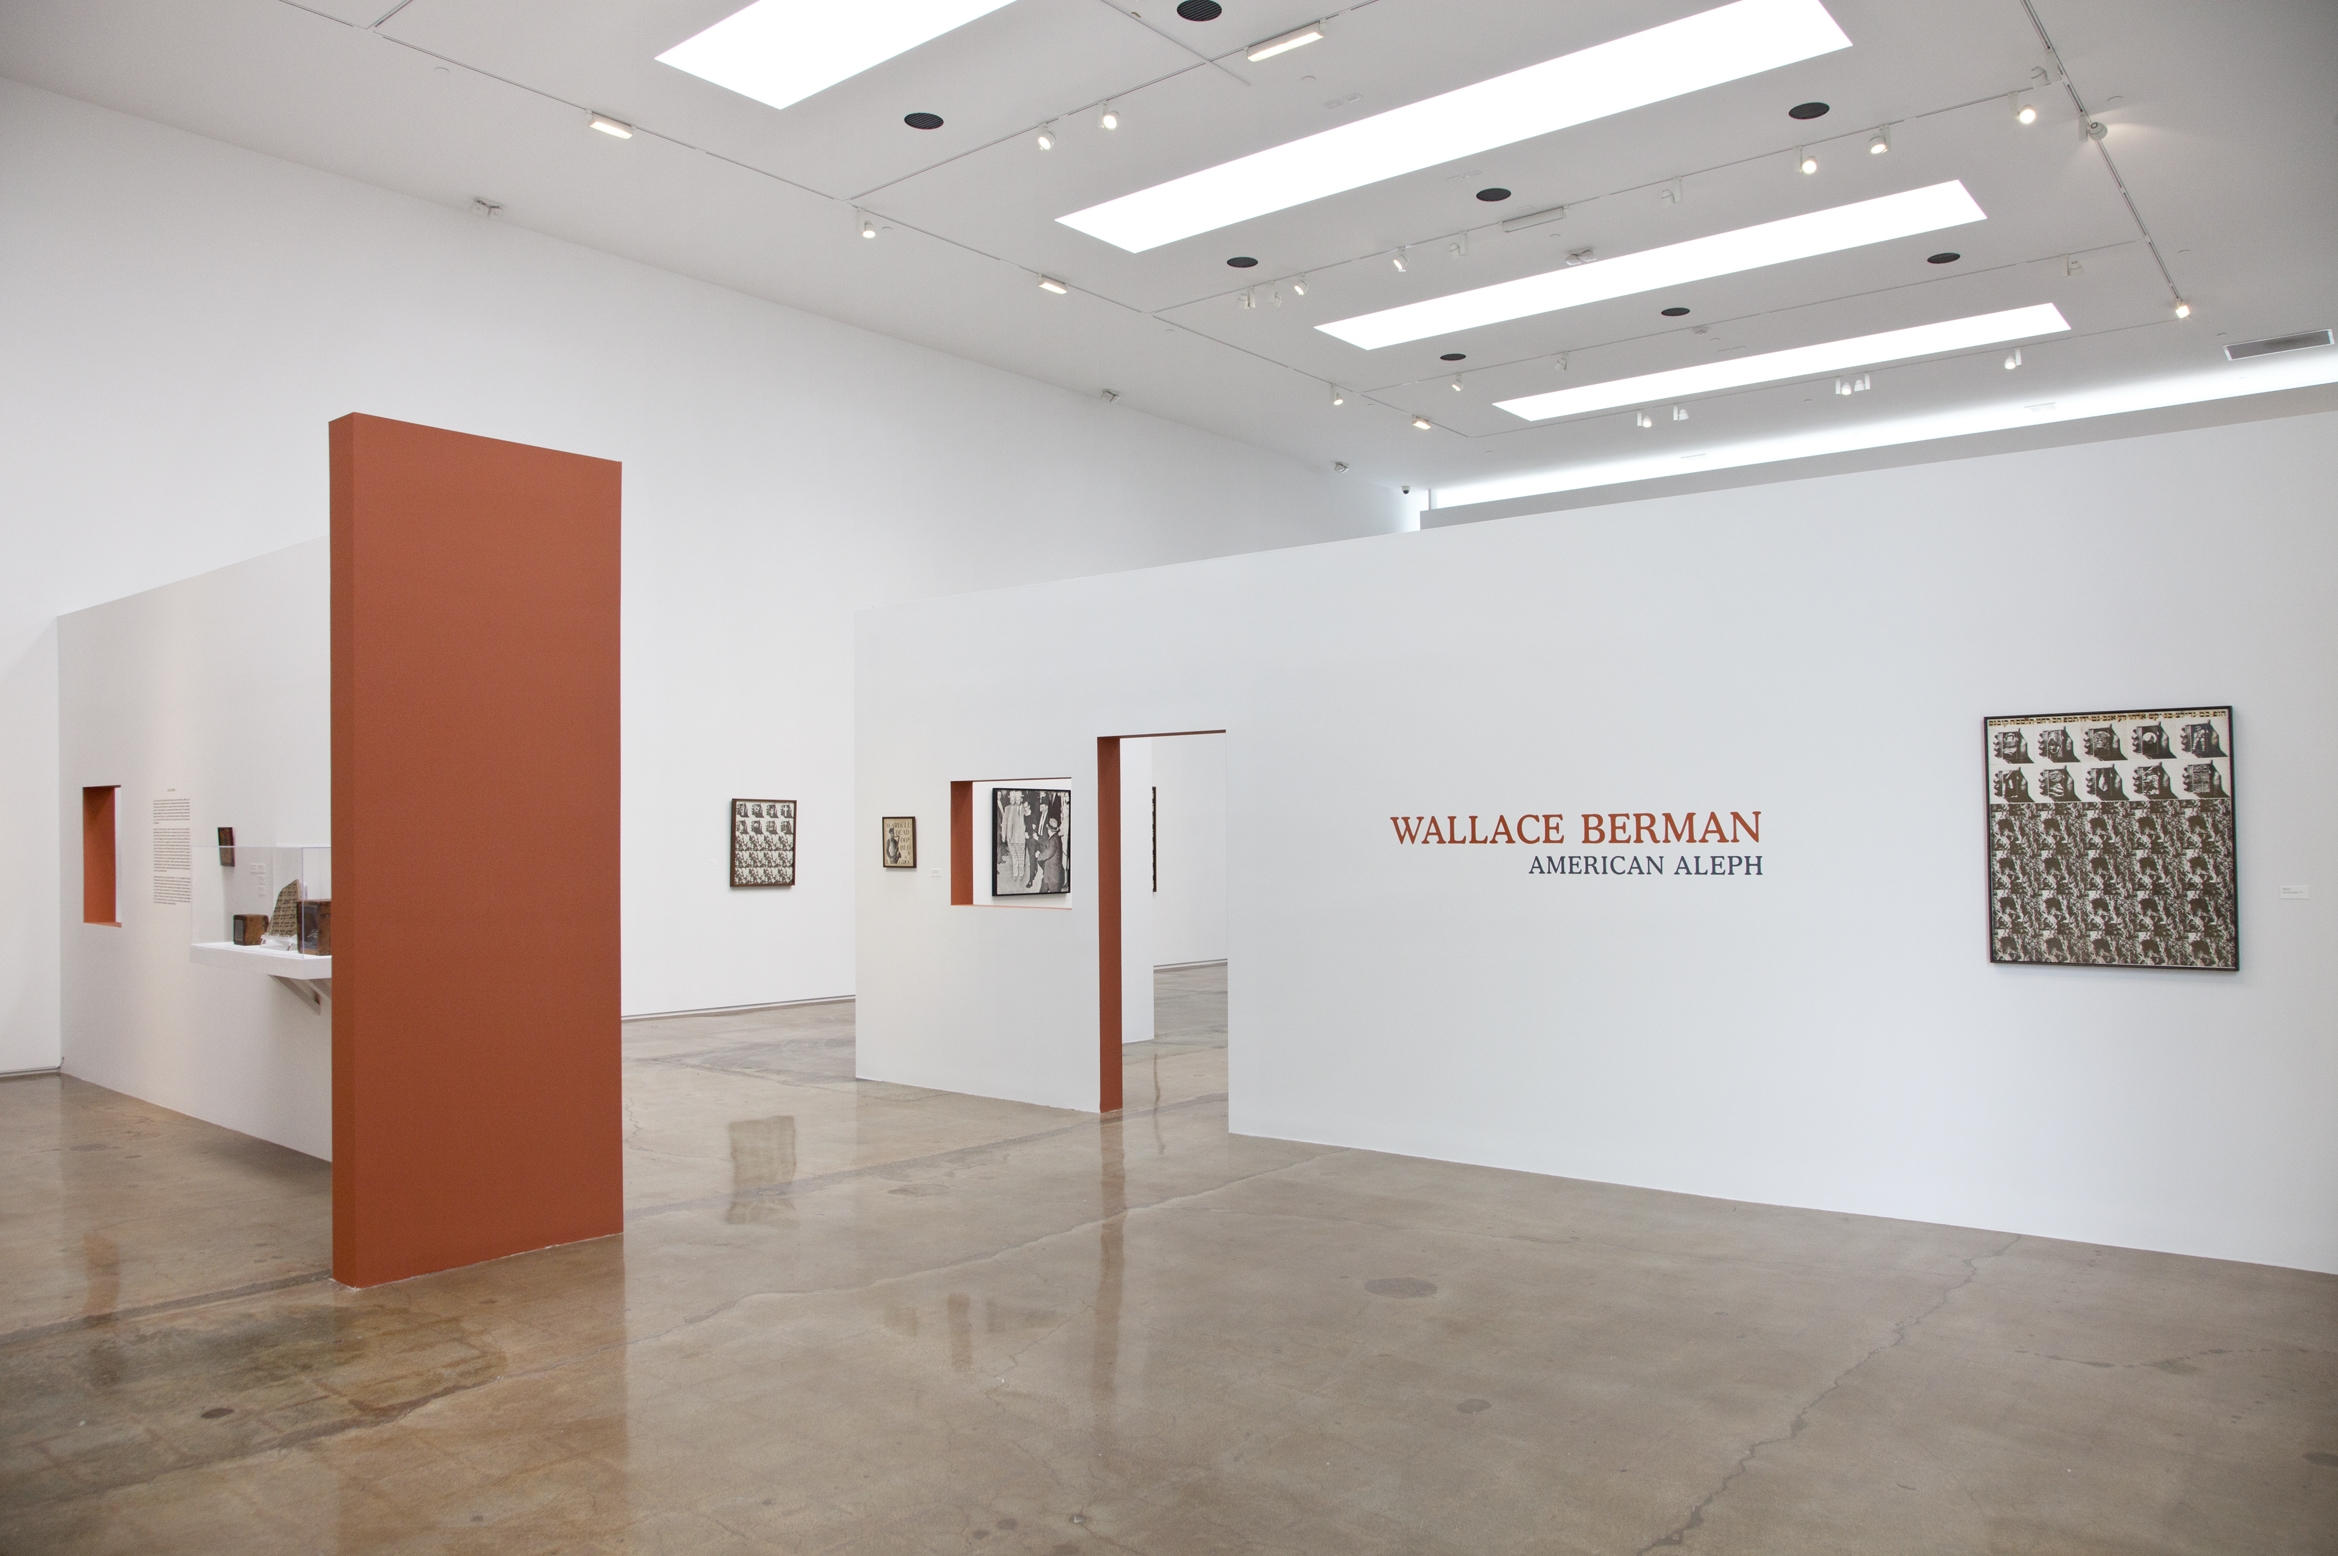 Wallace Berman, American Aleph, May 6 - June 25, 2016